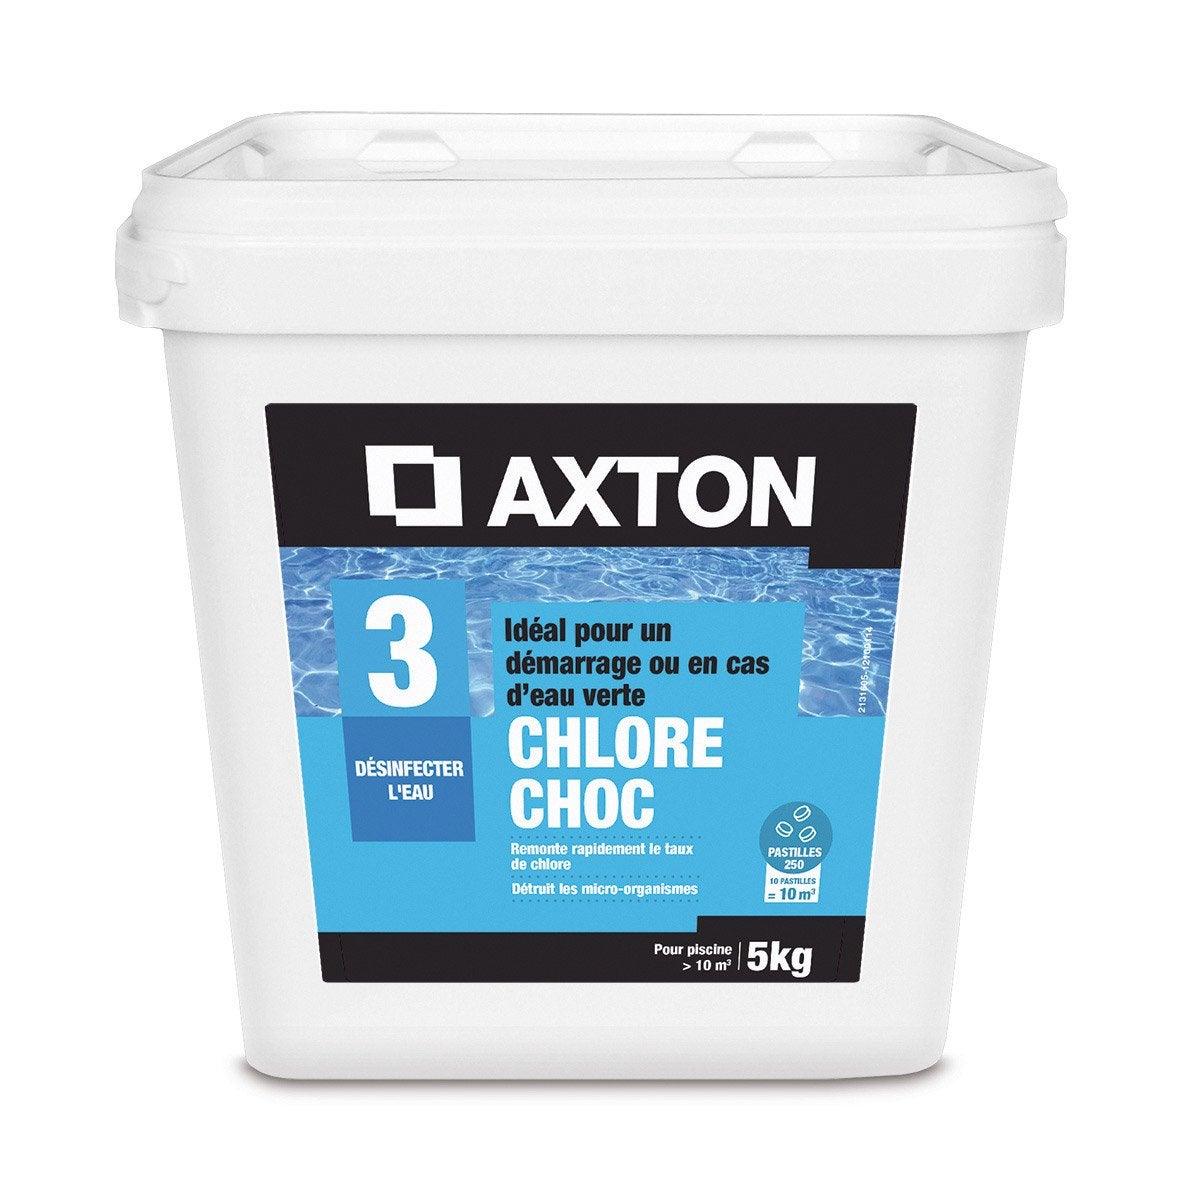 Chlore choc piscine axton pastille 5 kg leroy merlin for Chlore choc piscine